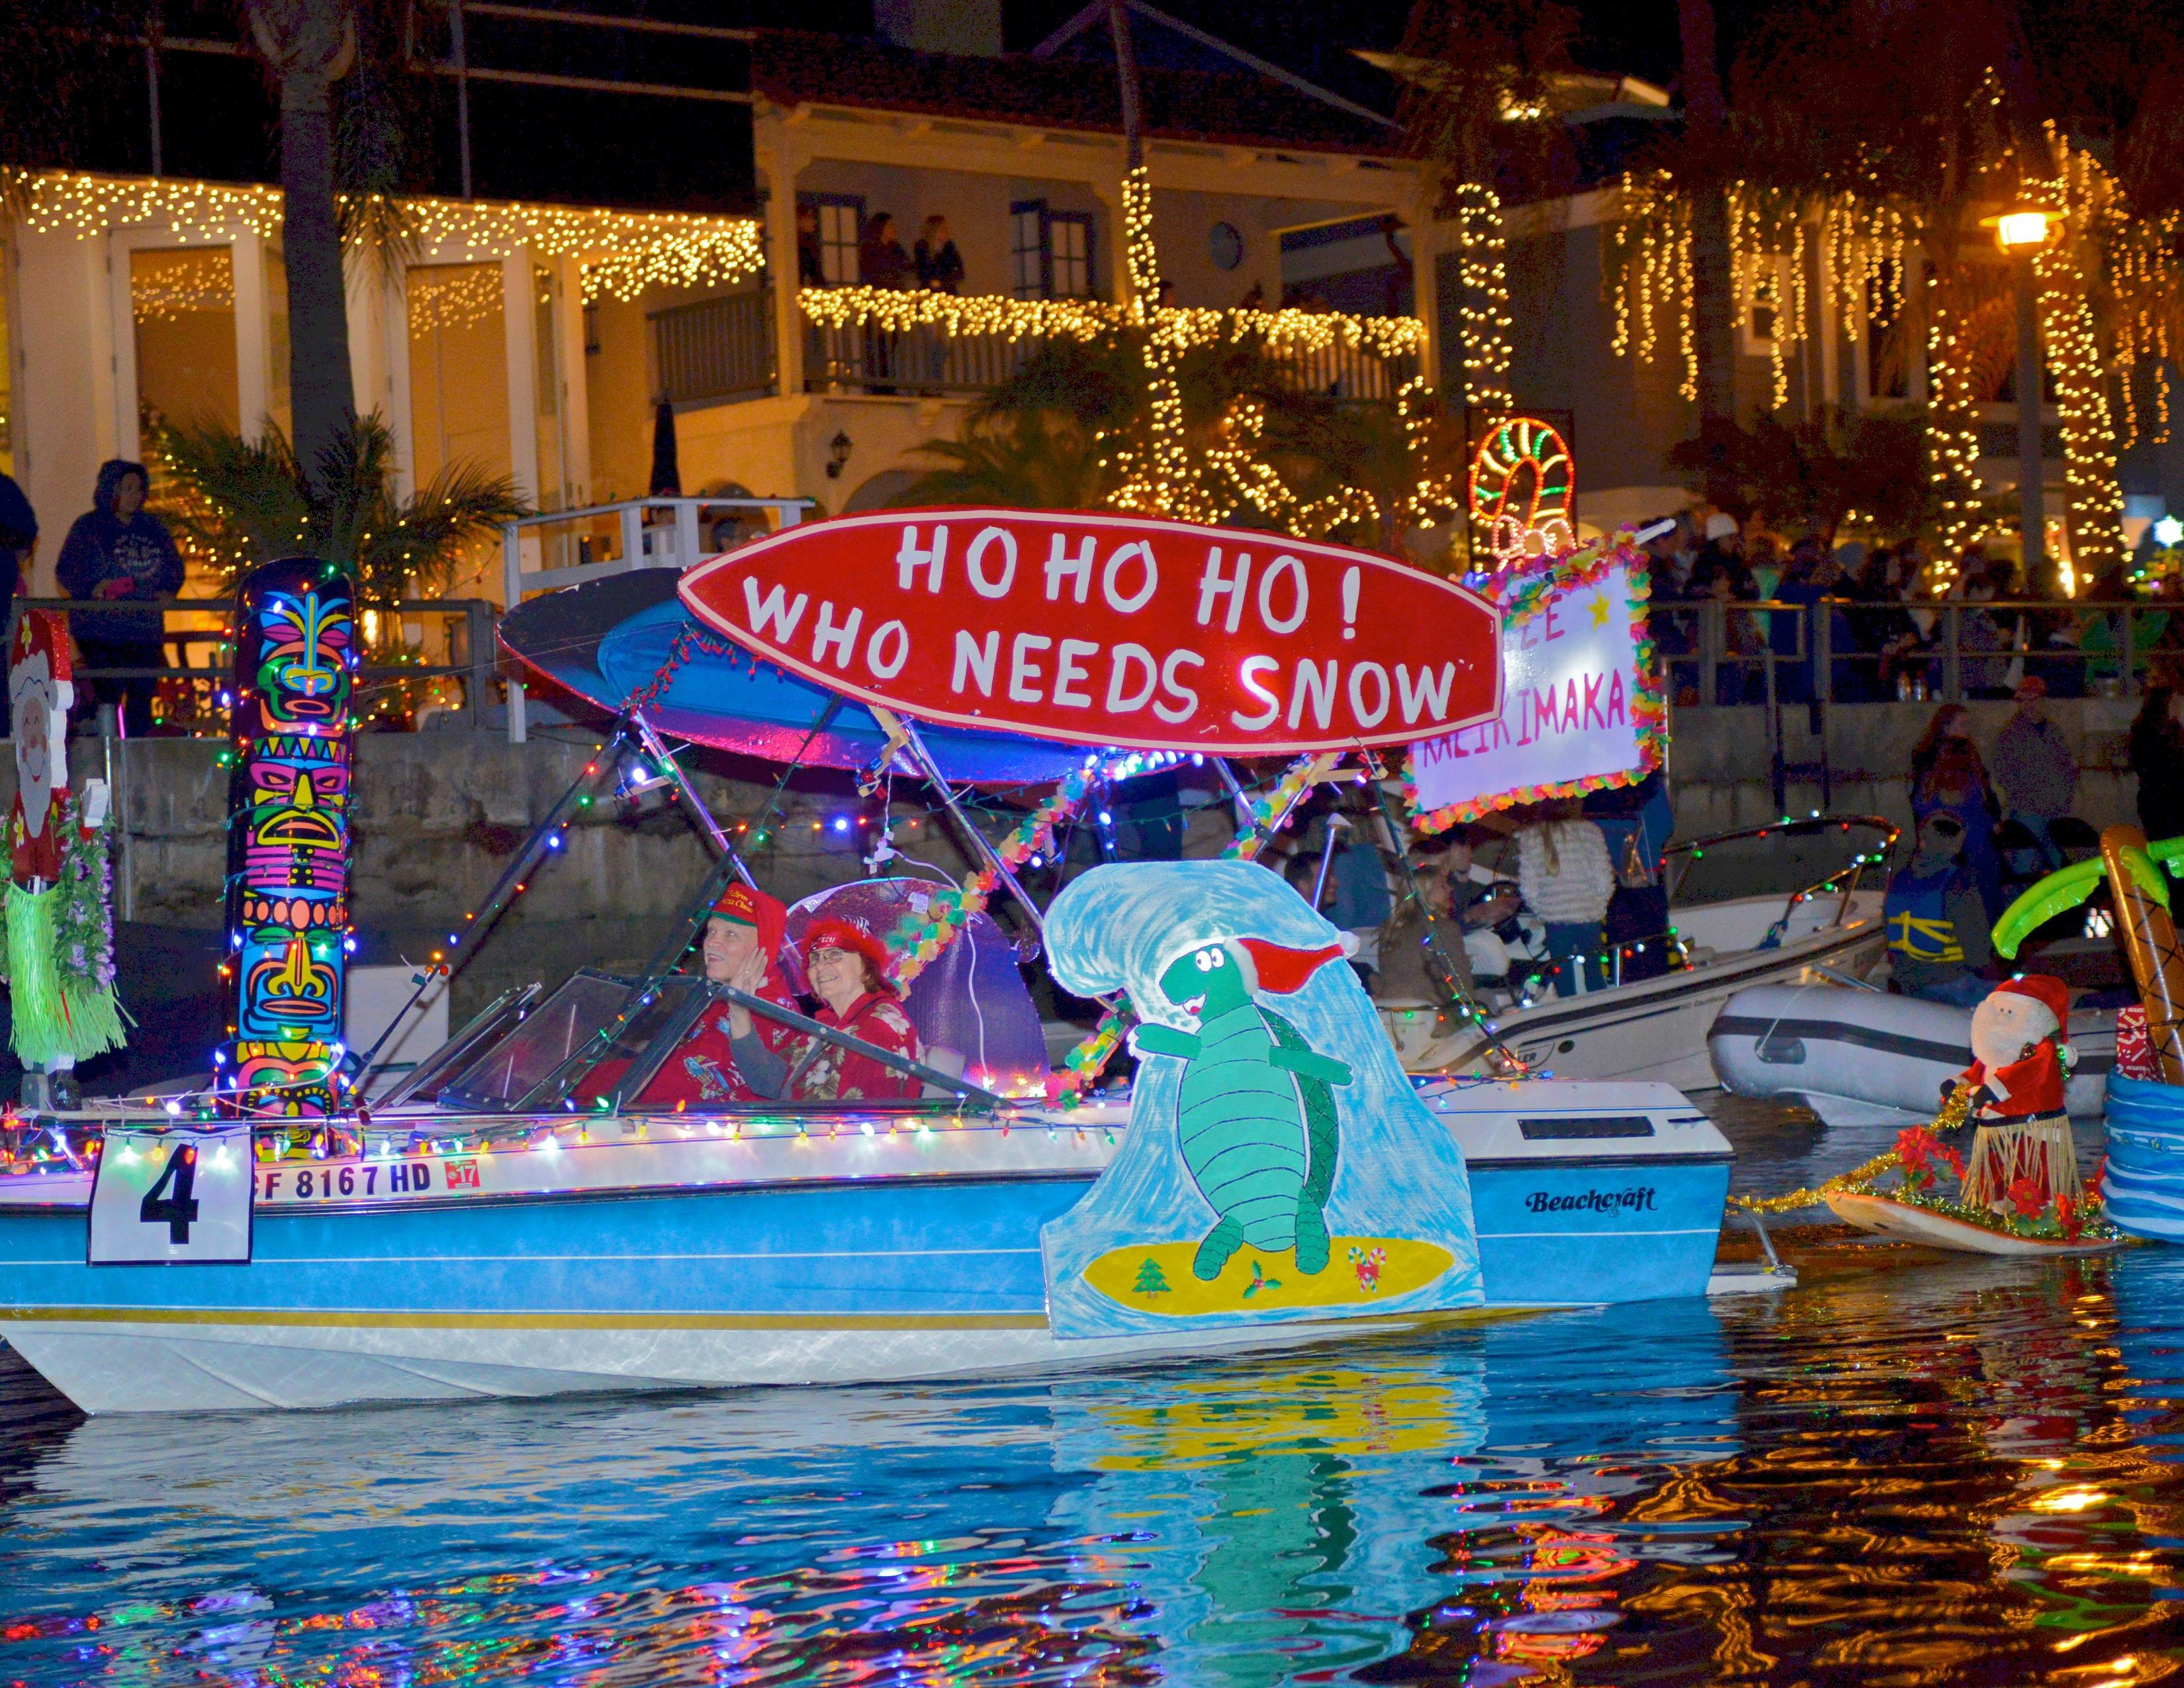 Island Christmas Theme.Naples Island Annual Holiday Boat Parade